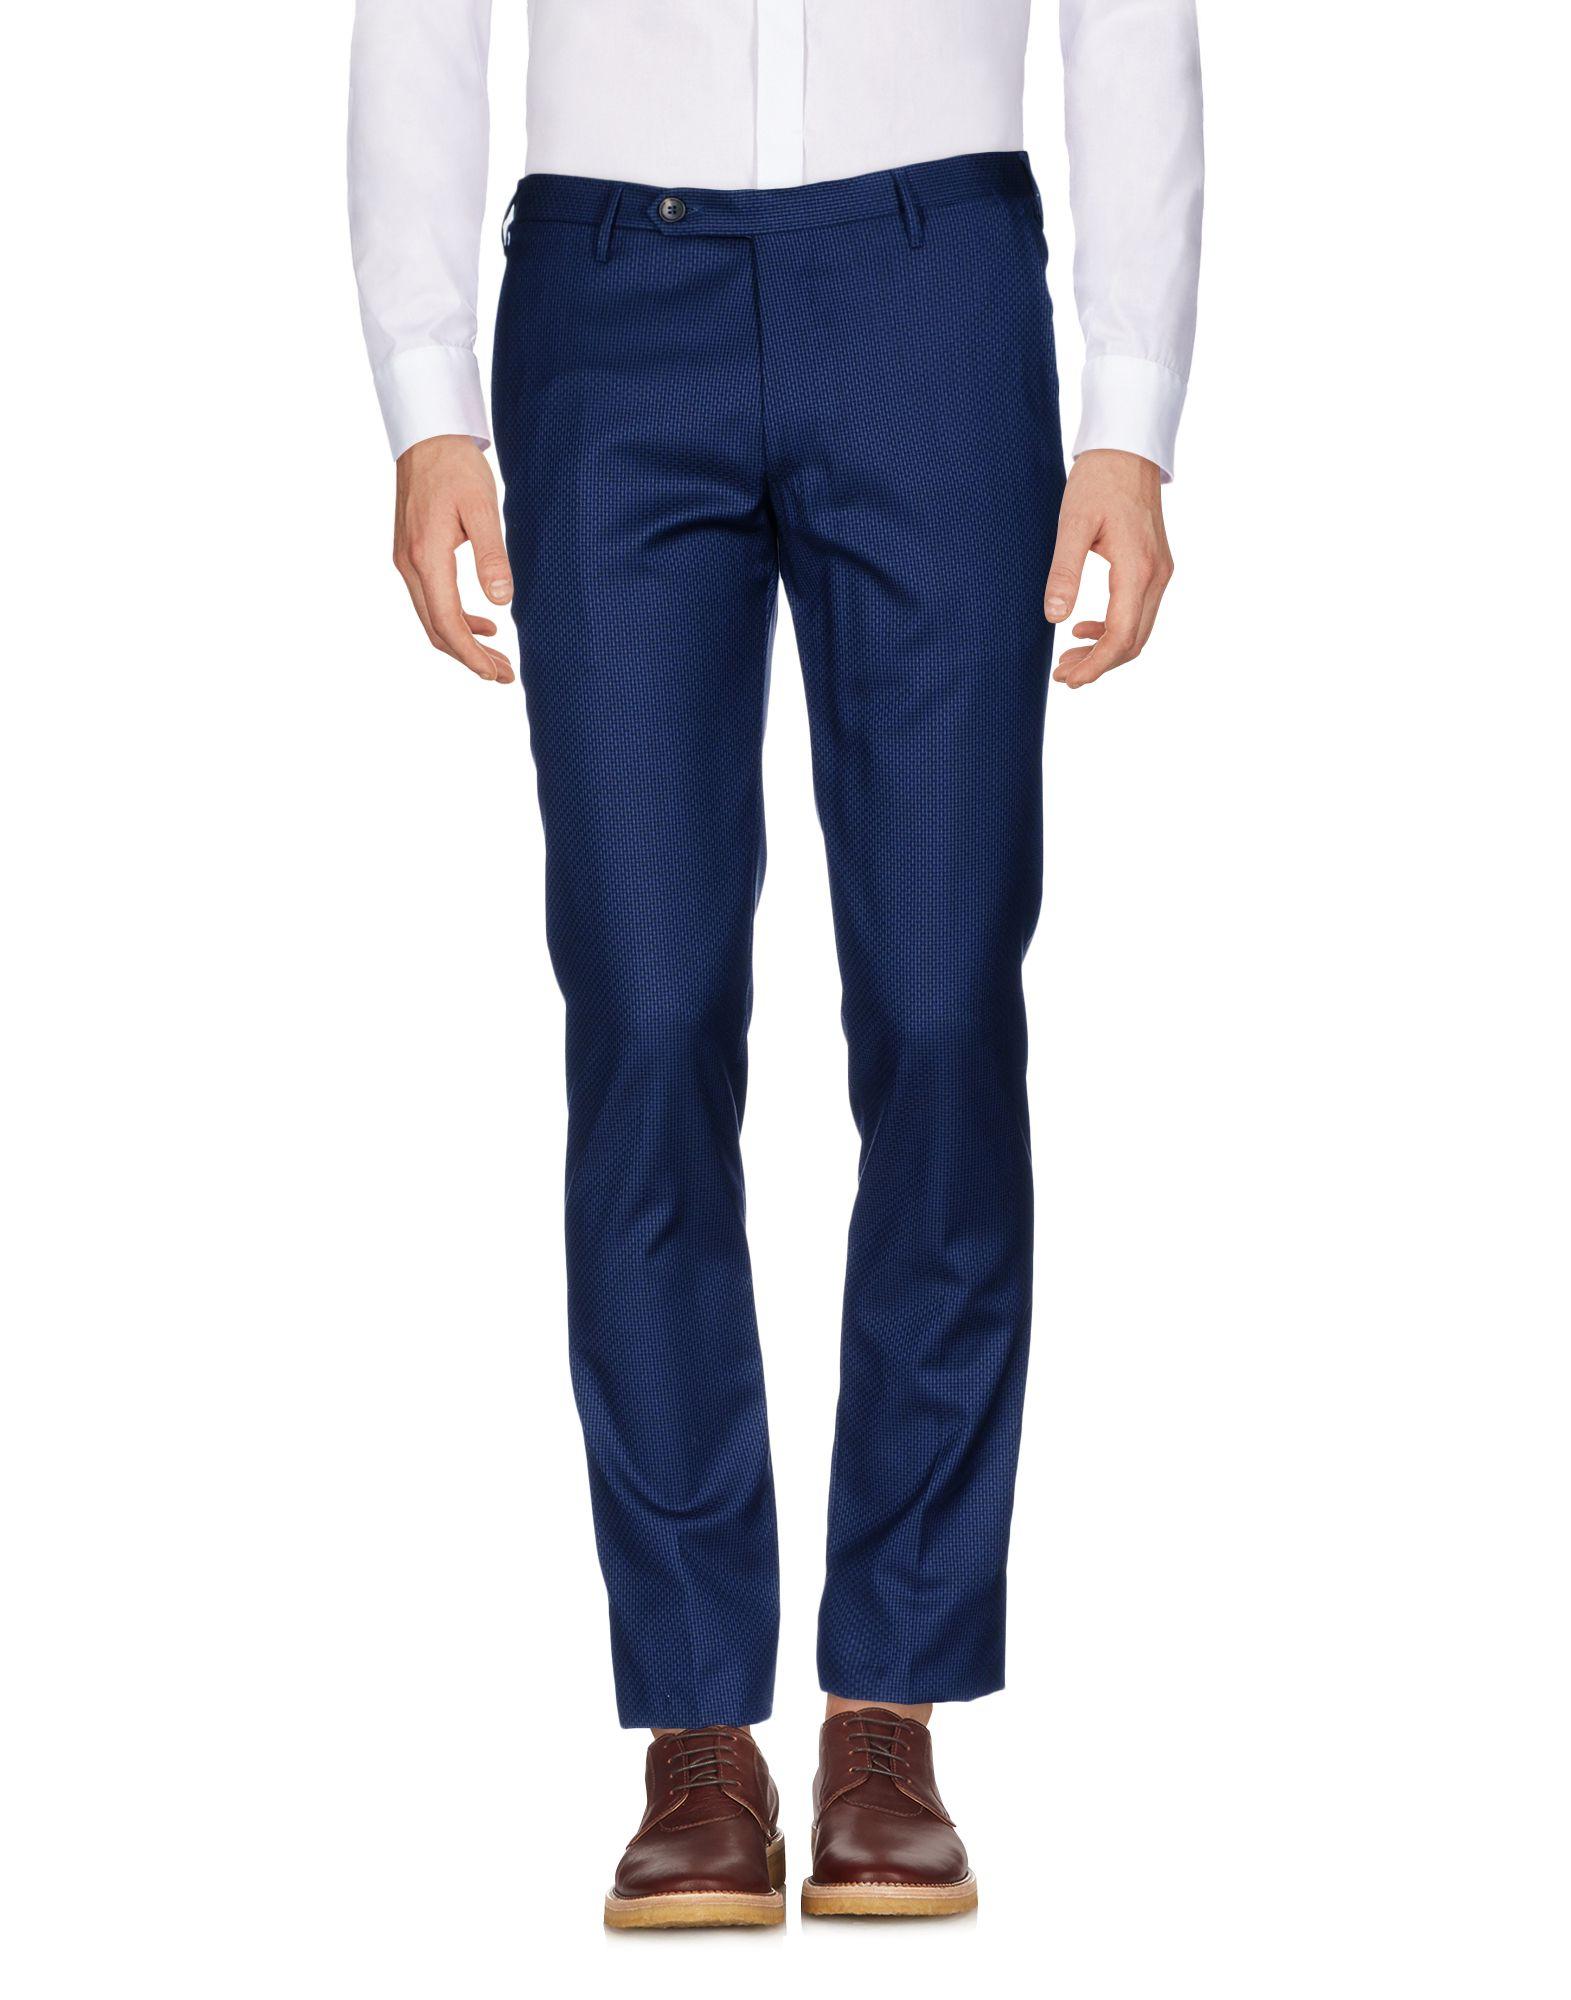 Pantalone Rota Uomo - Acquista online su